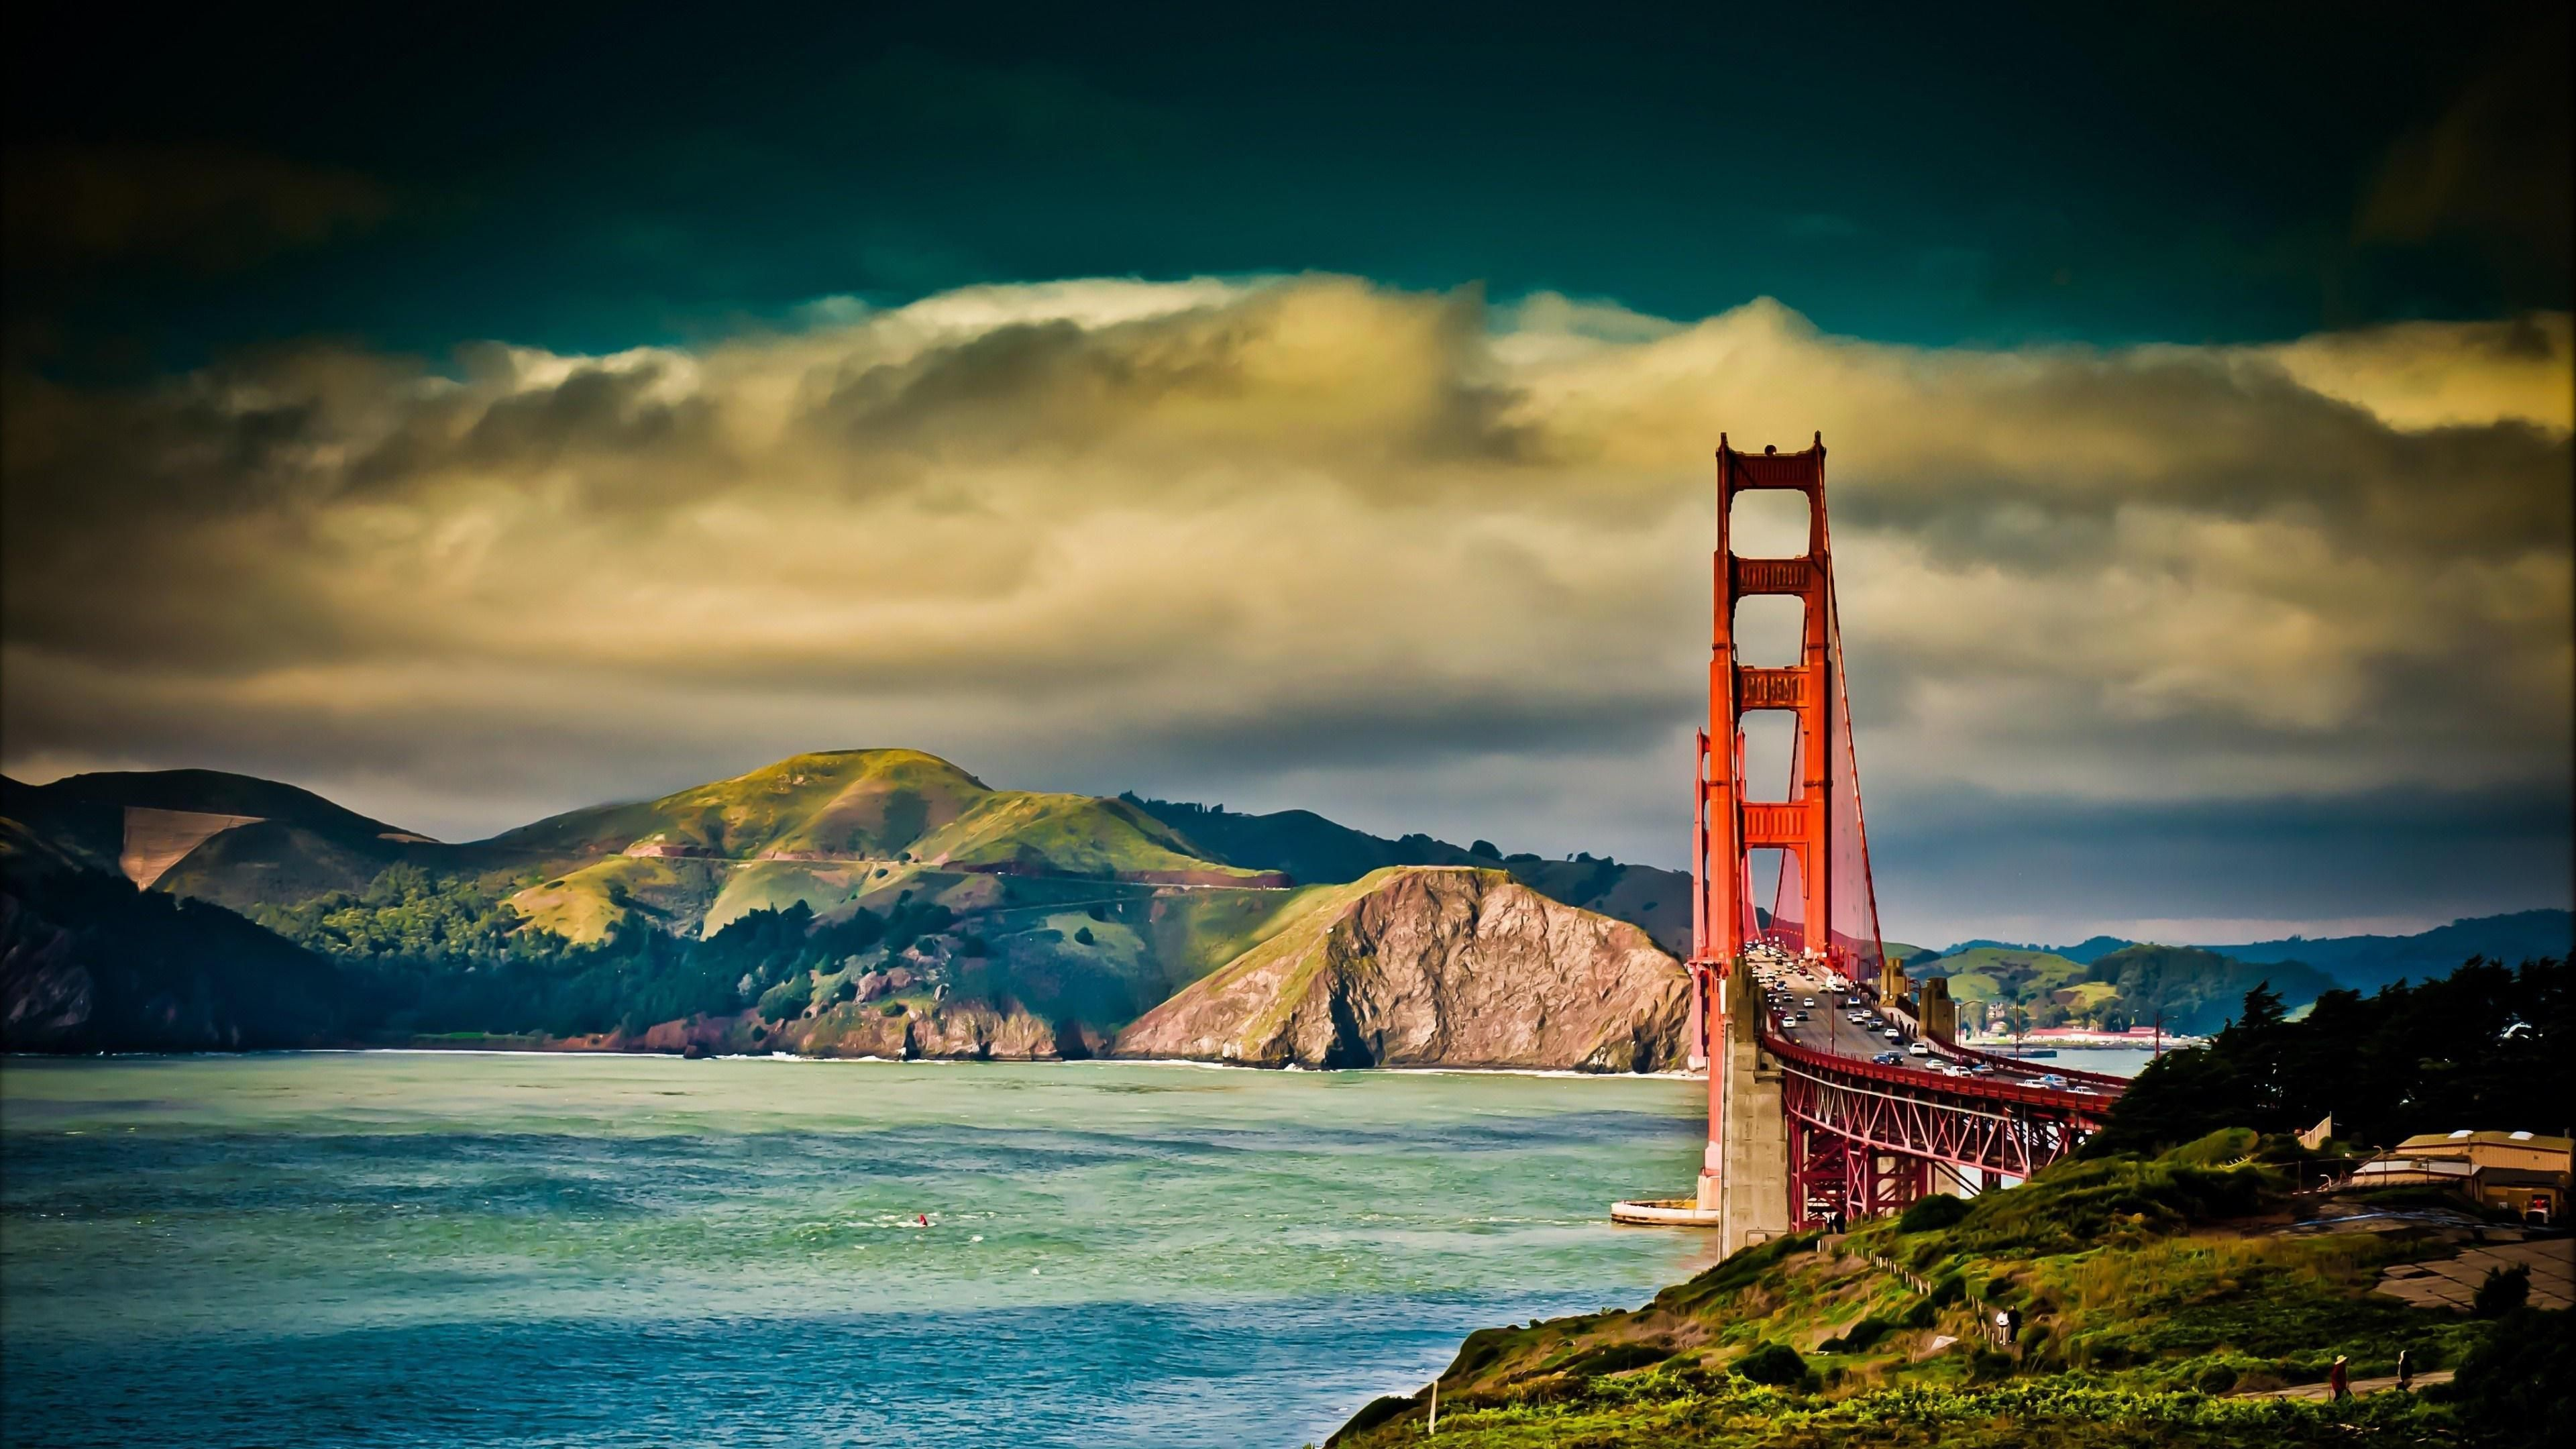 Nature Mountains View Wallpaper Golden Gate Golden Gate Bridge San Francisco Bridge